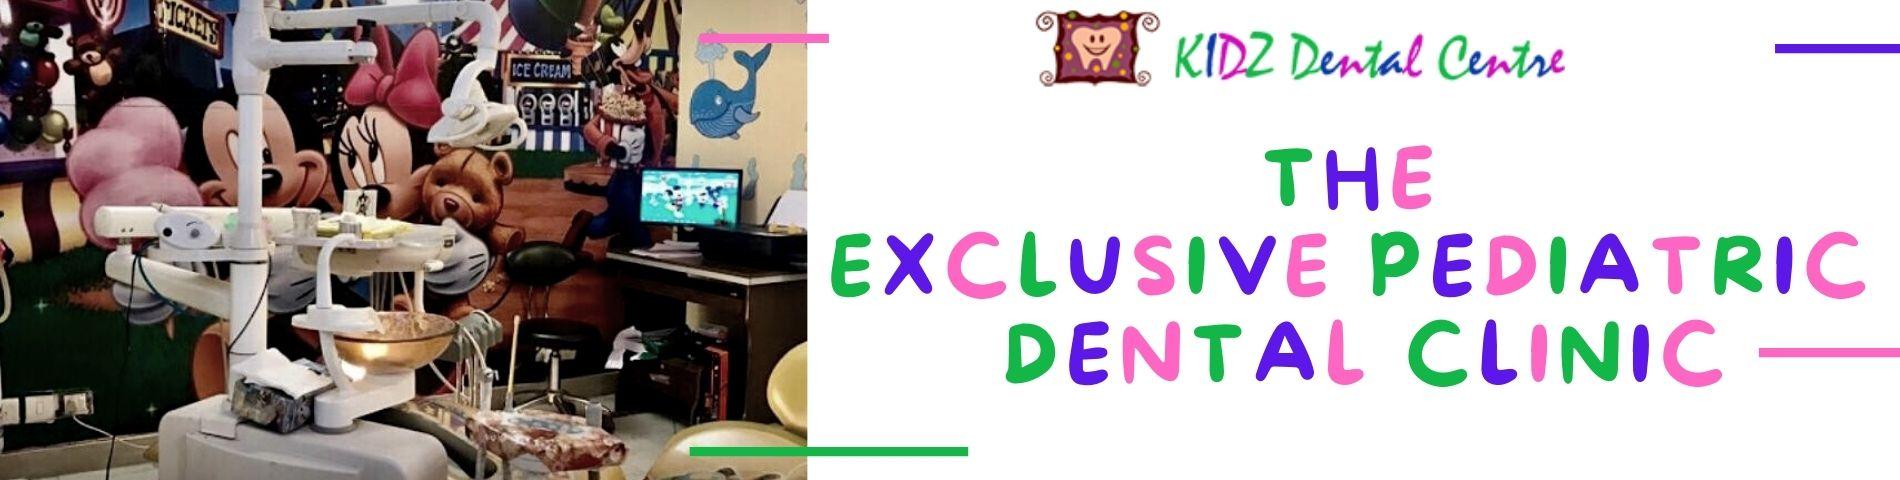 pediatric dentist in gurgaon